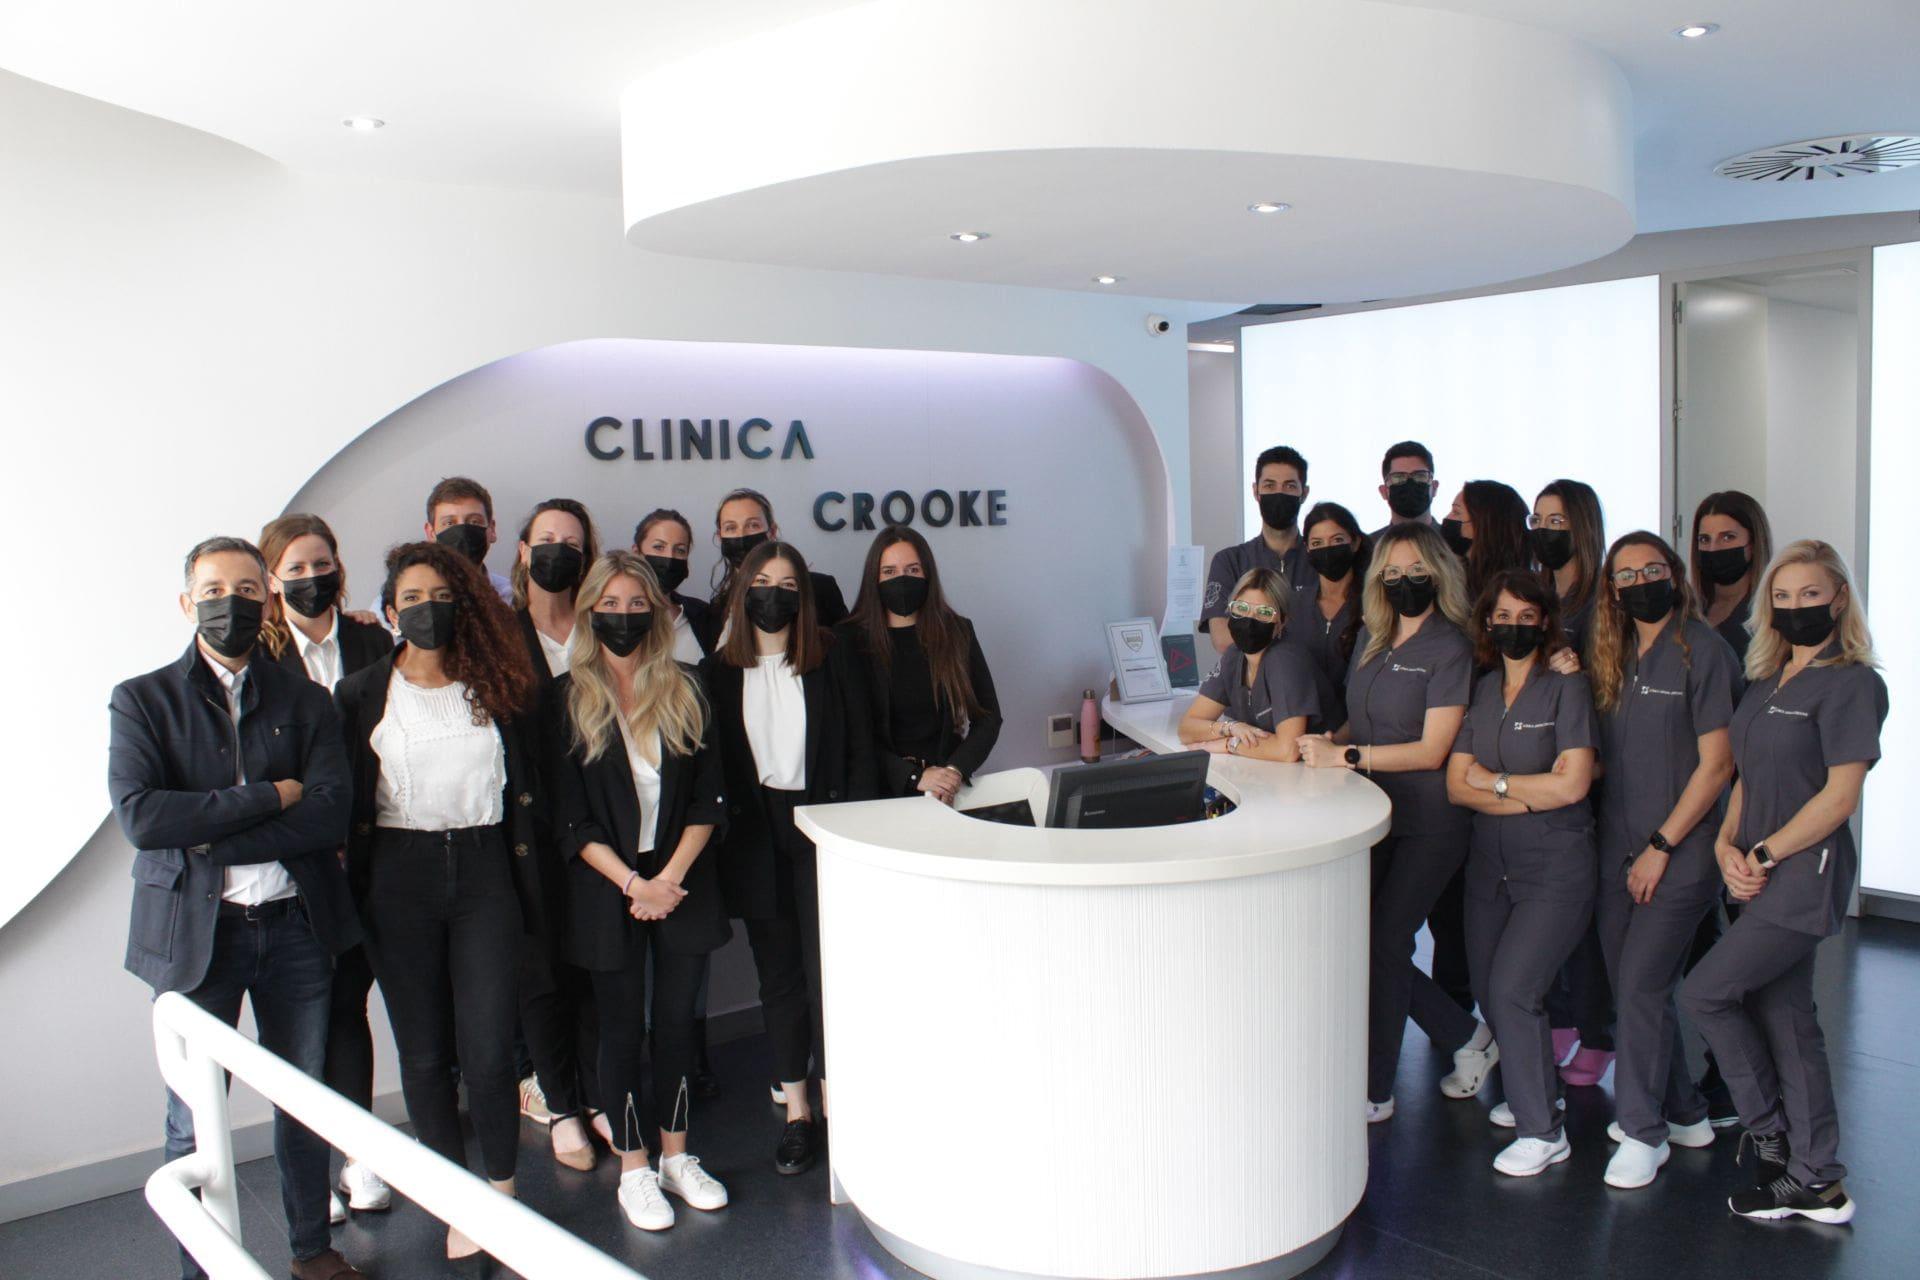 crooke clinics team